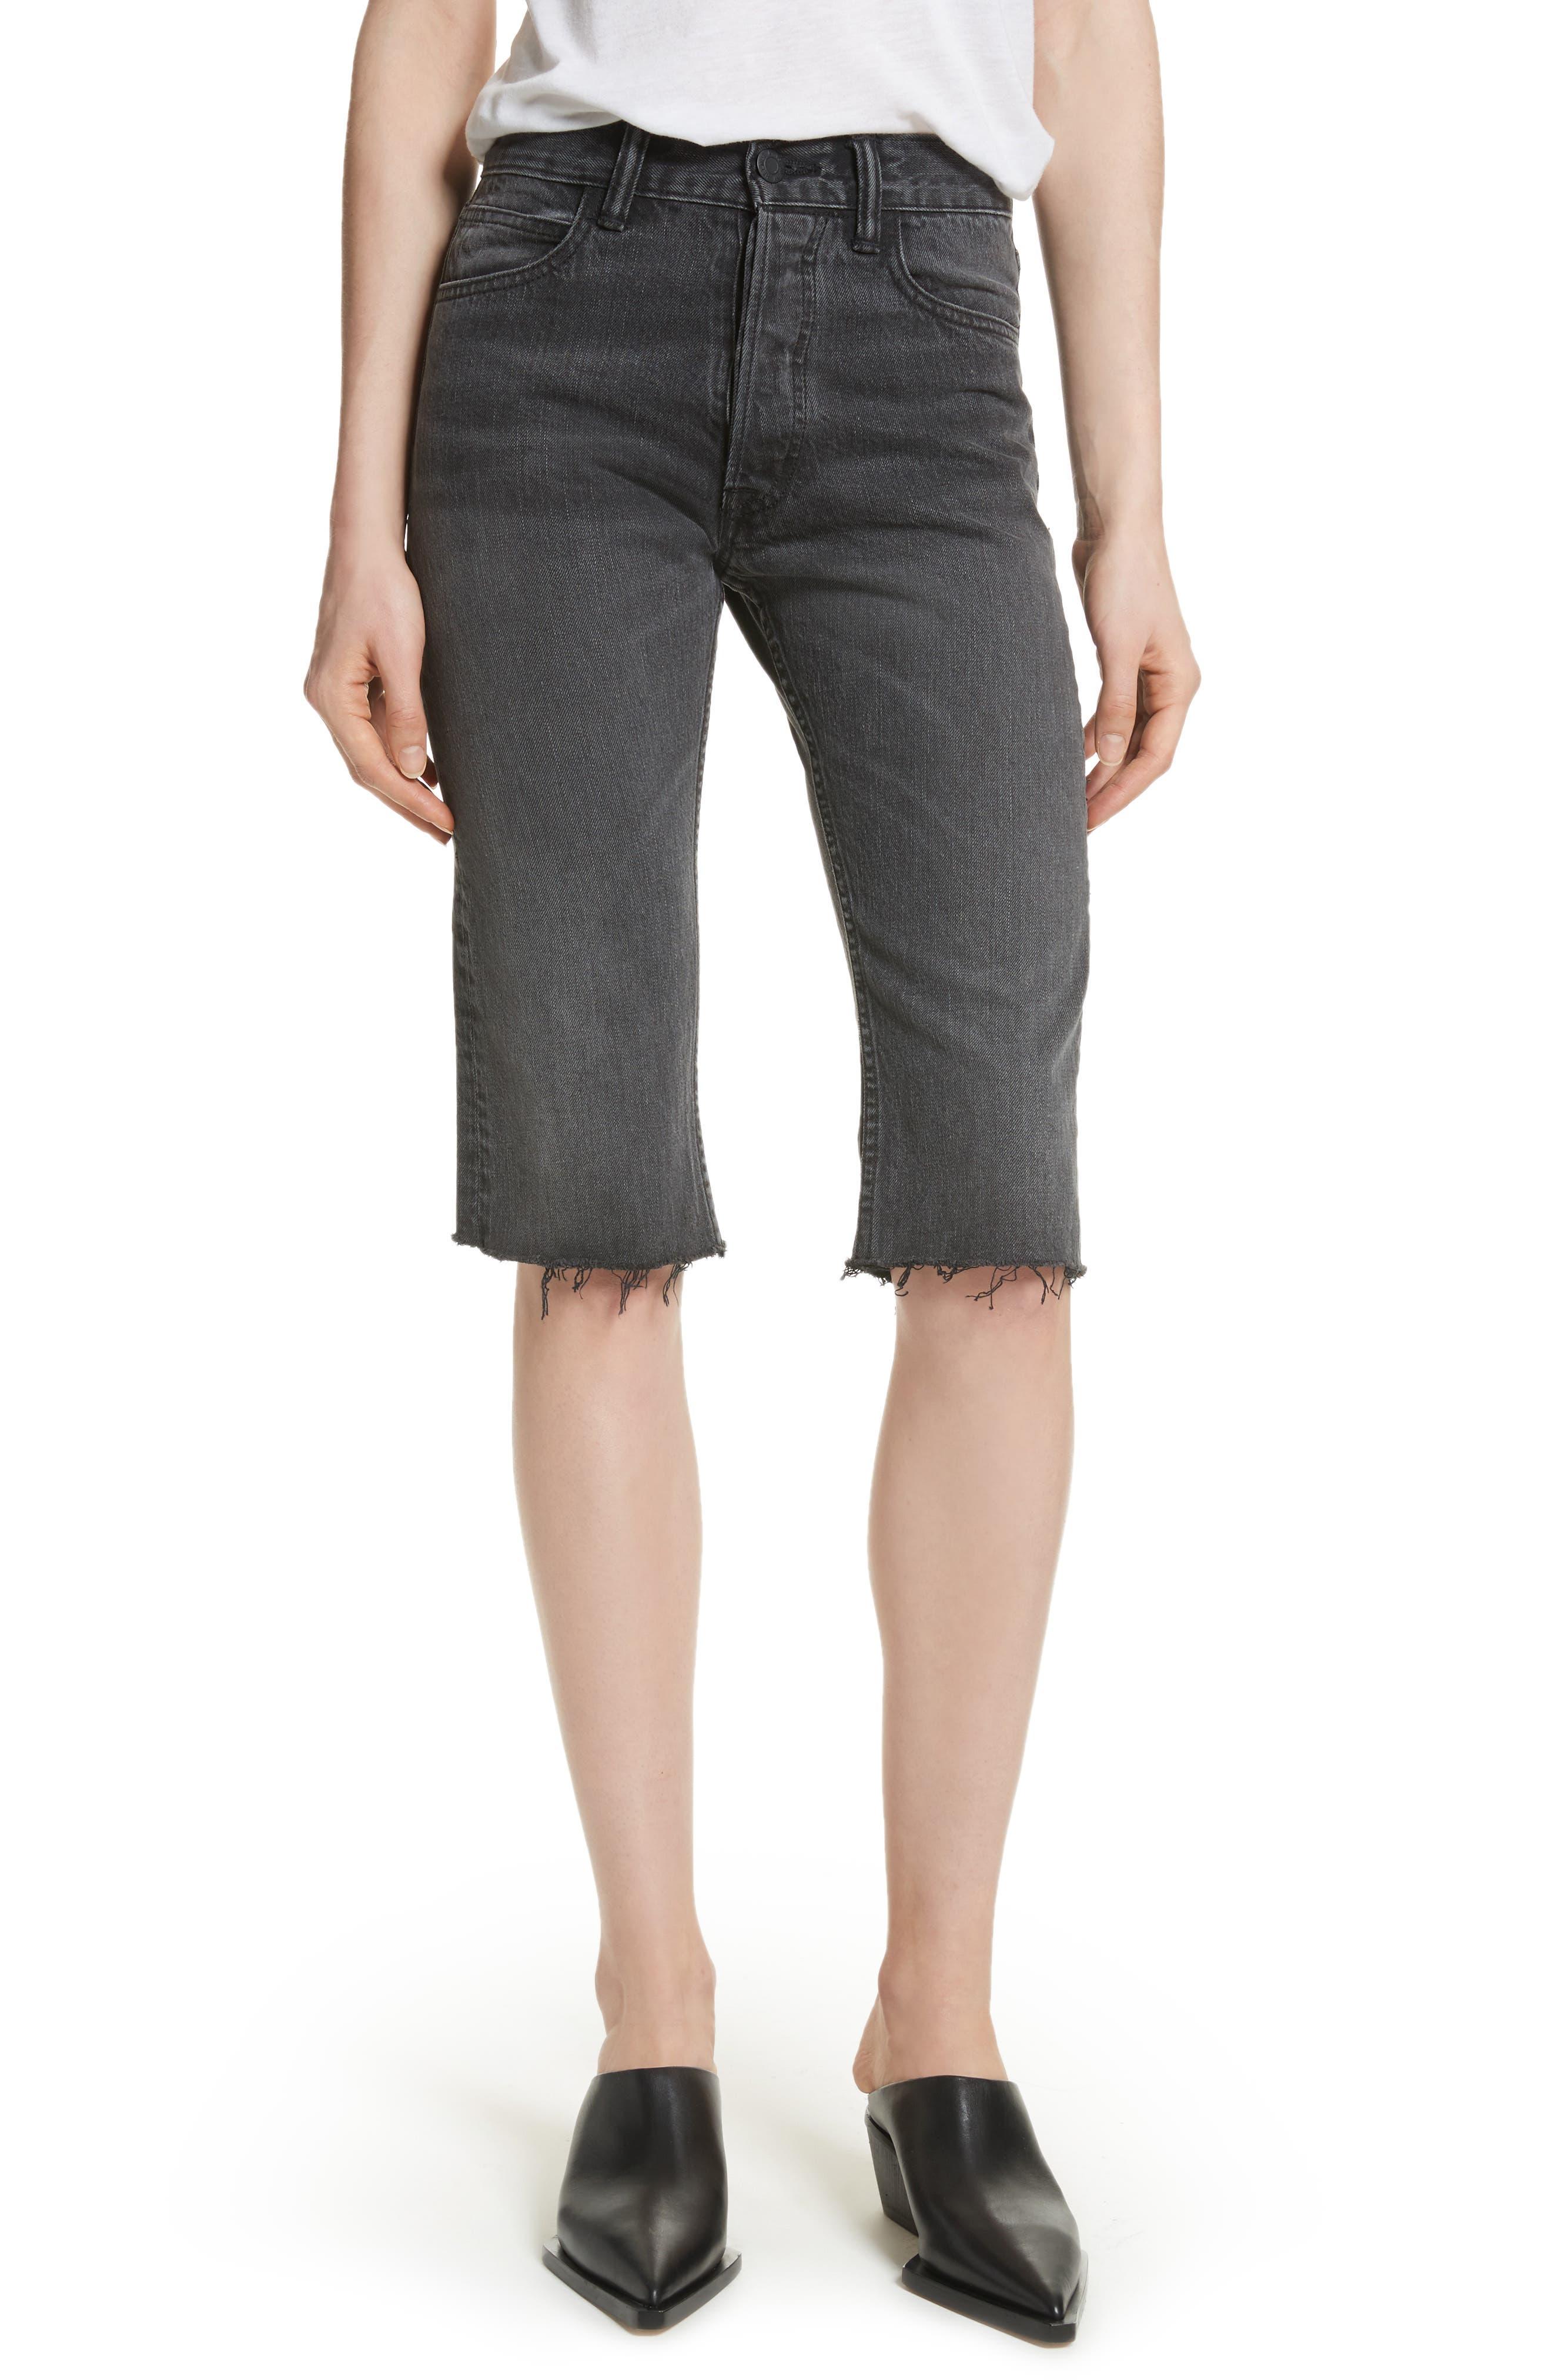 Cutoff Knee Length Denim Shorts,                         Main,                         color, Rigid Black